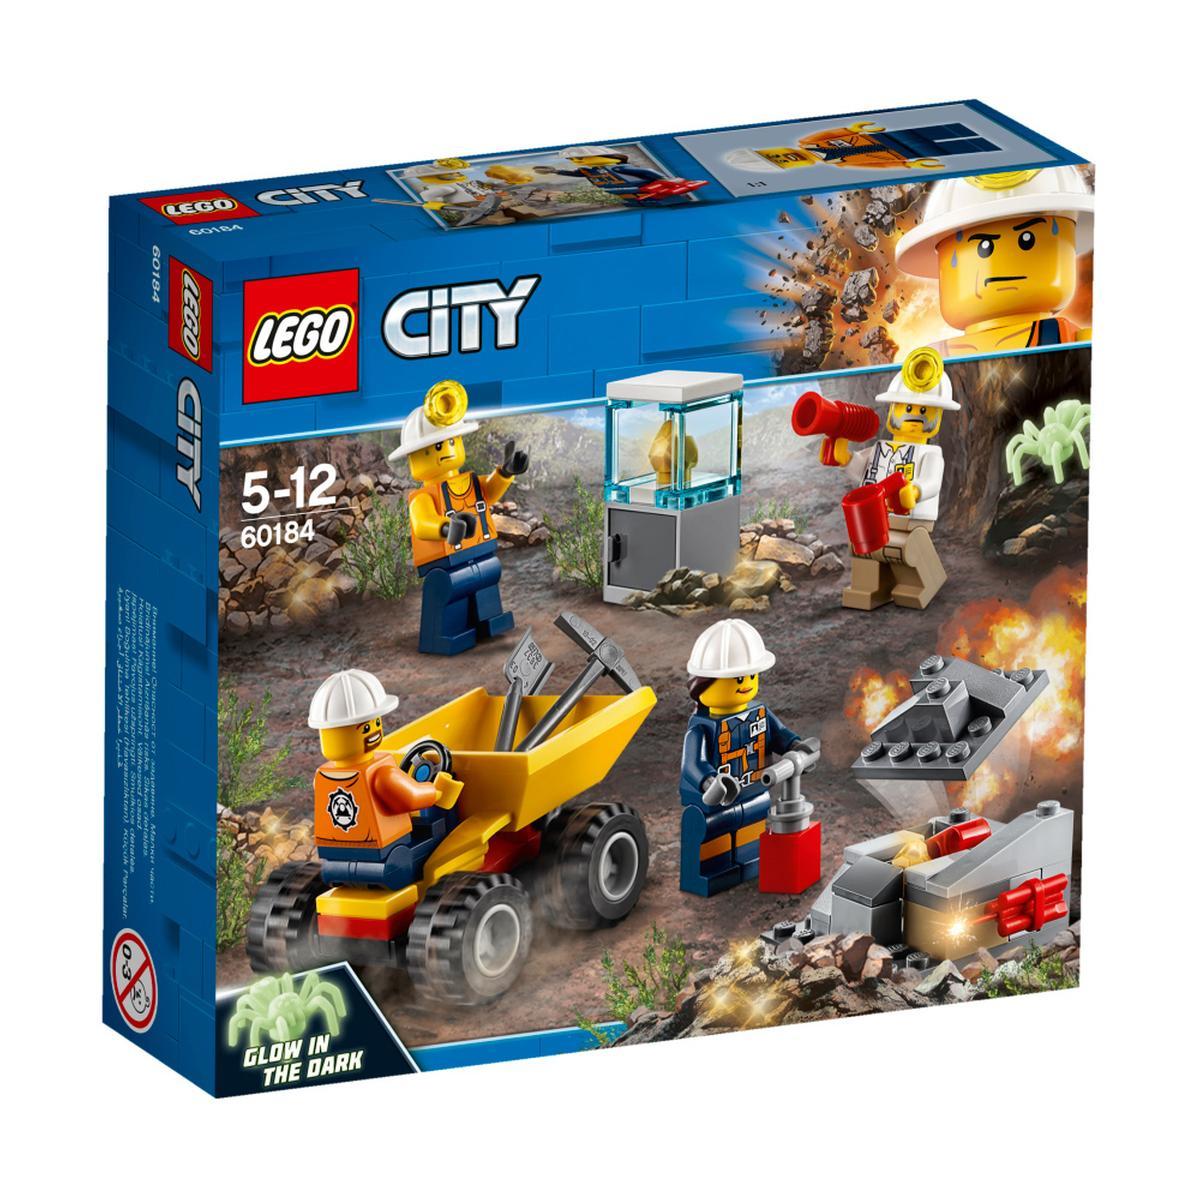 LEGO City - Min: Equipo - 60184